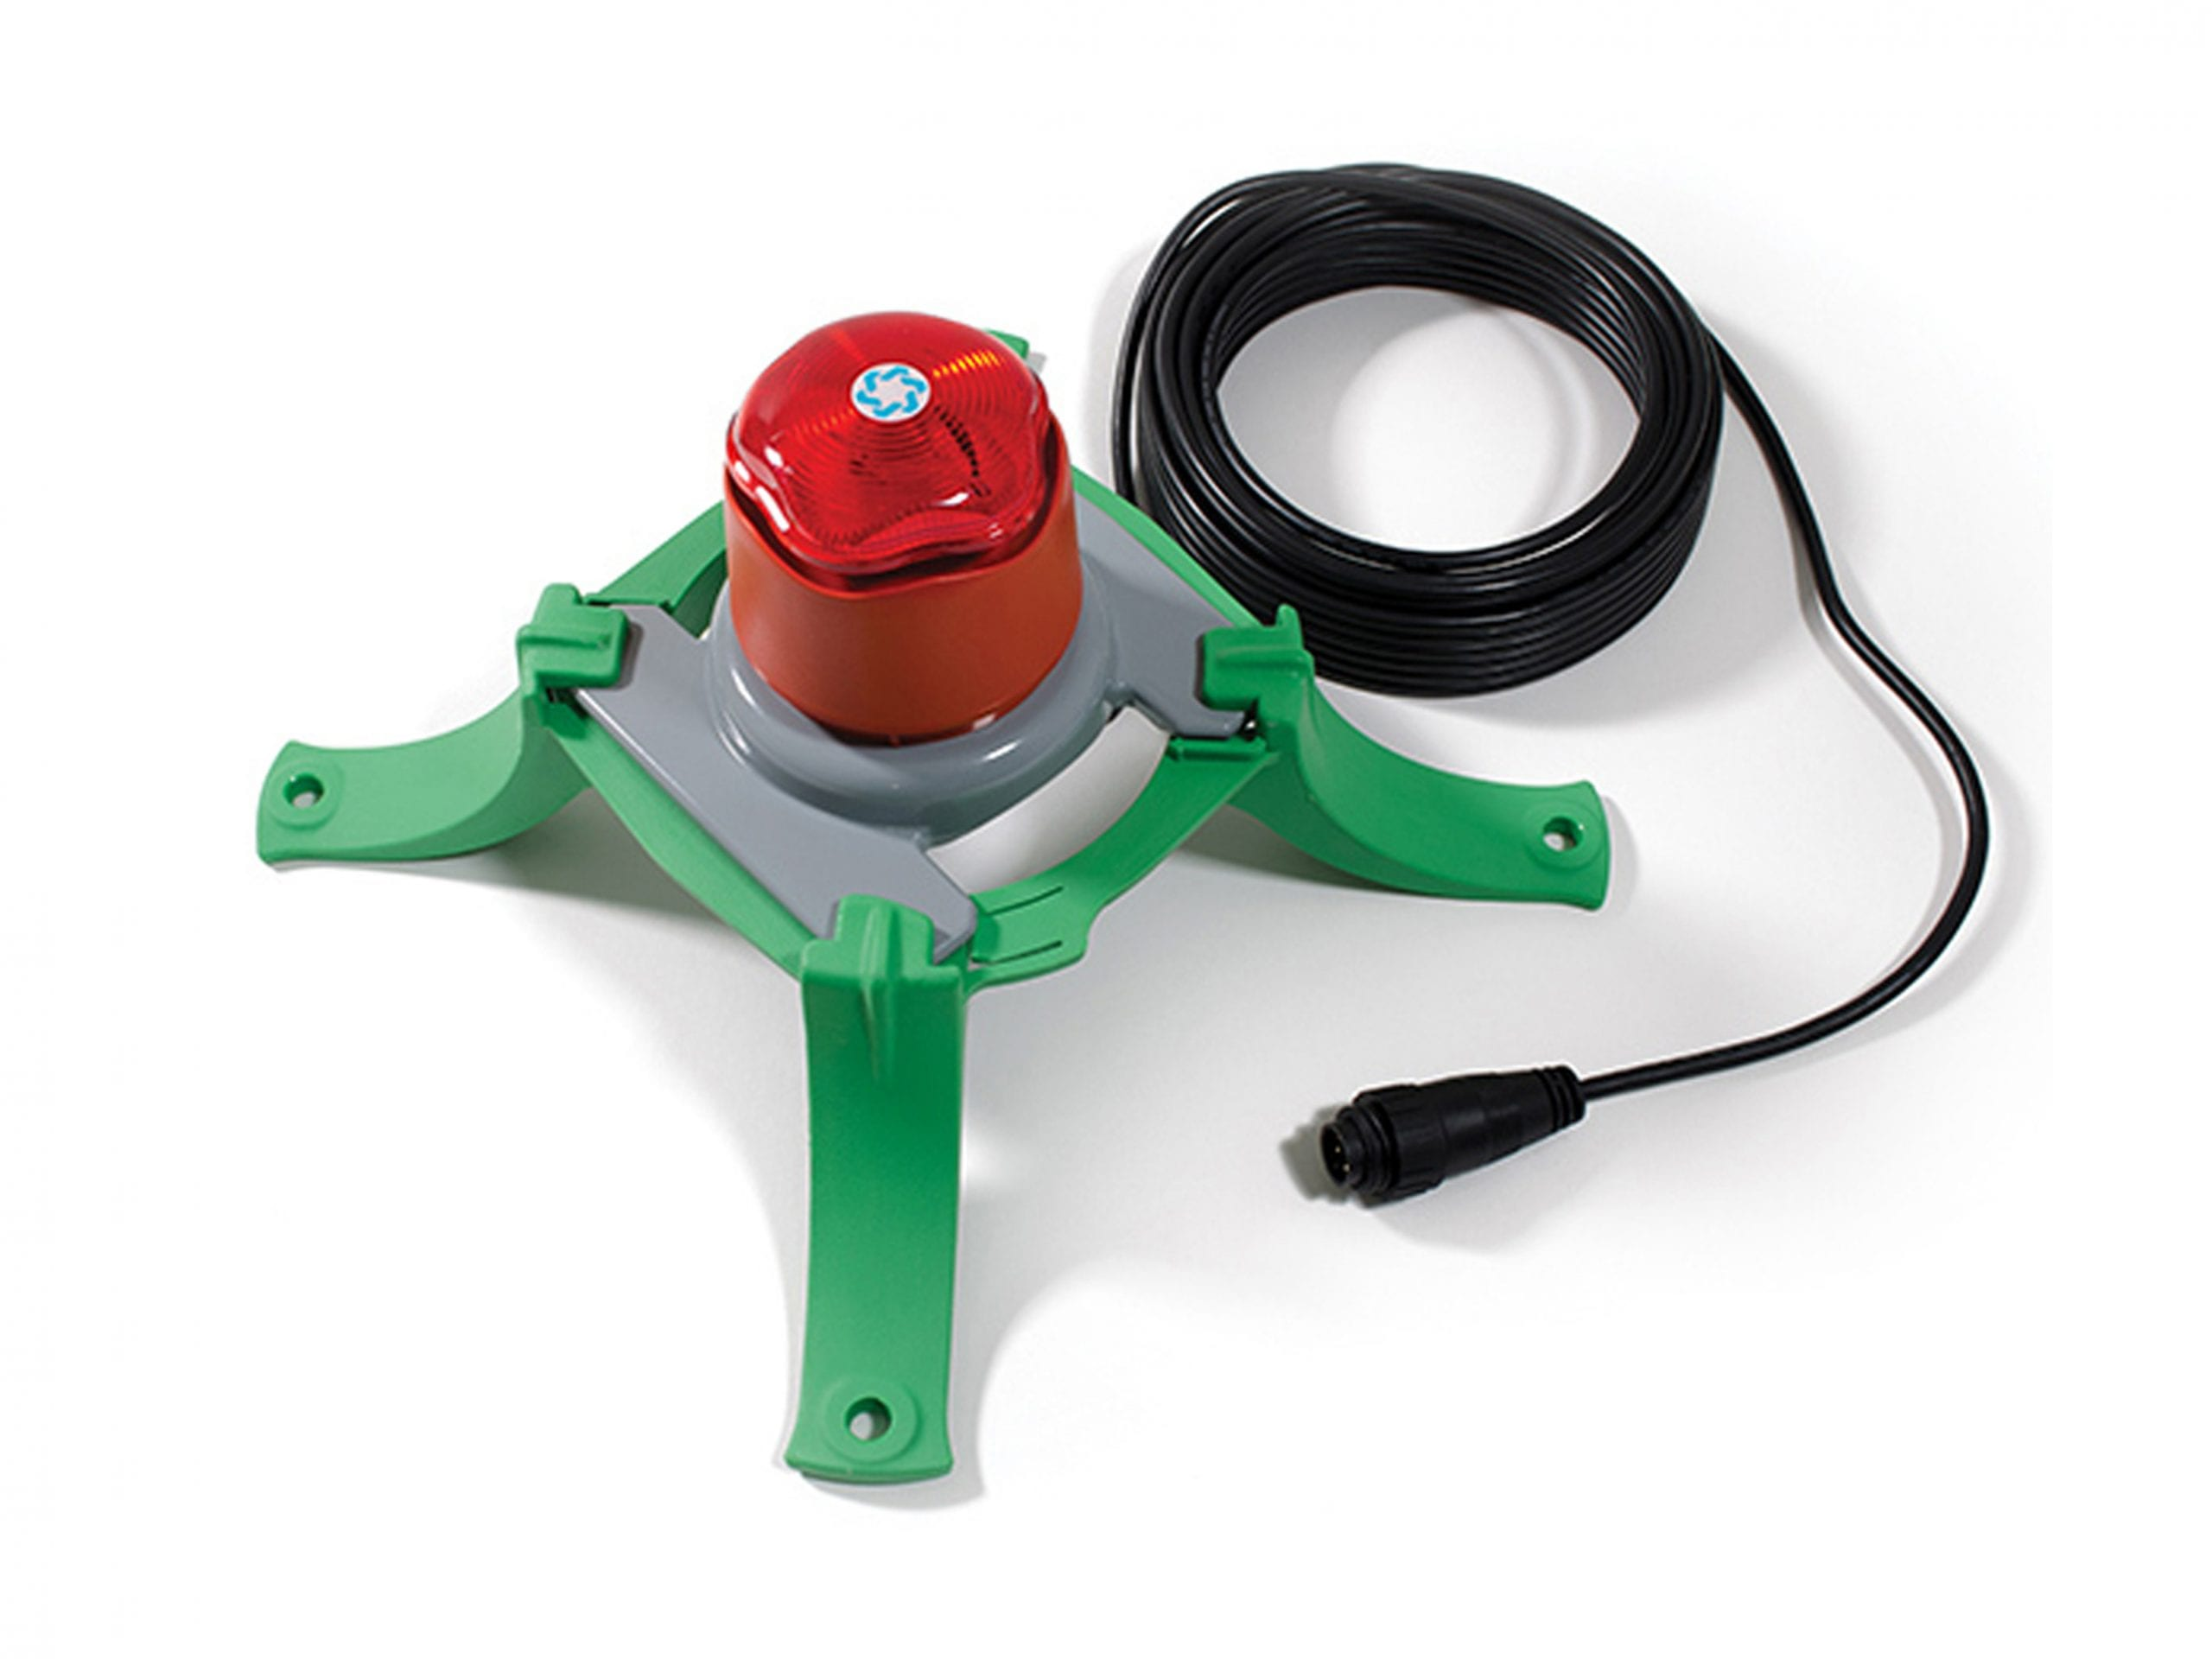 Radex External Strobe Light and Audible Alarm System